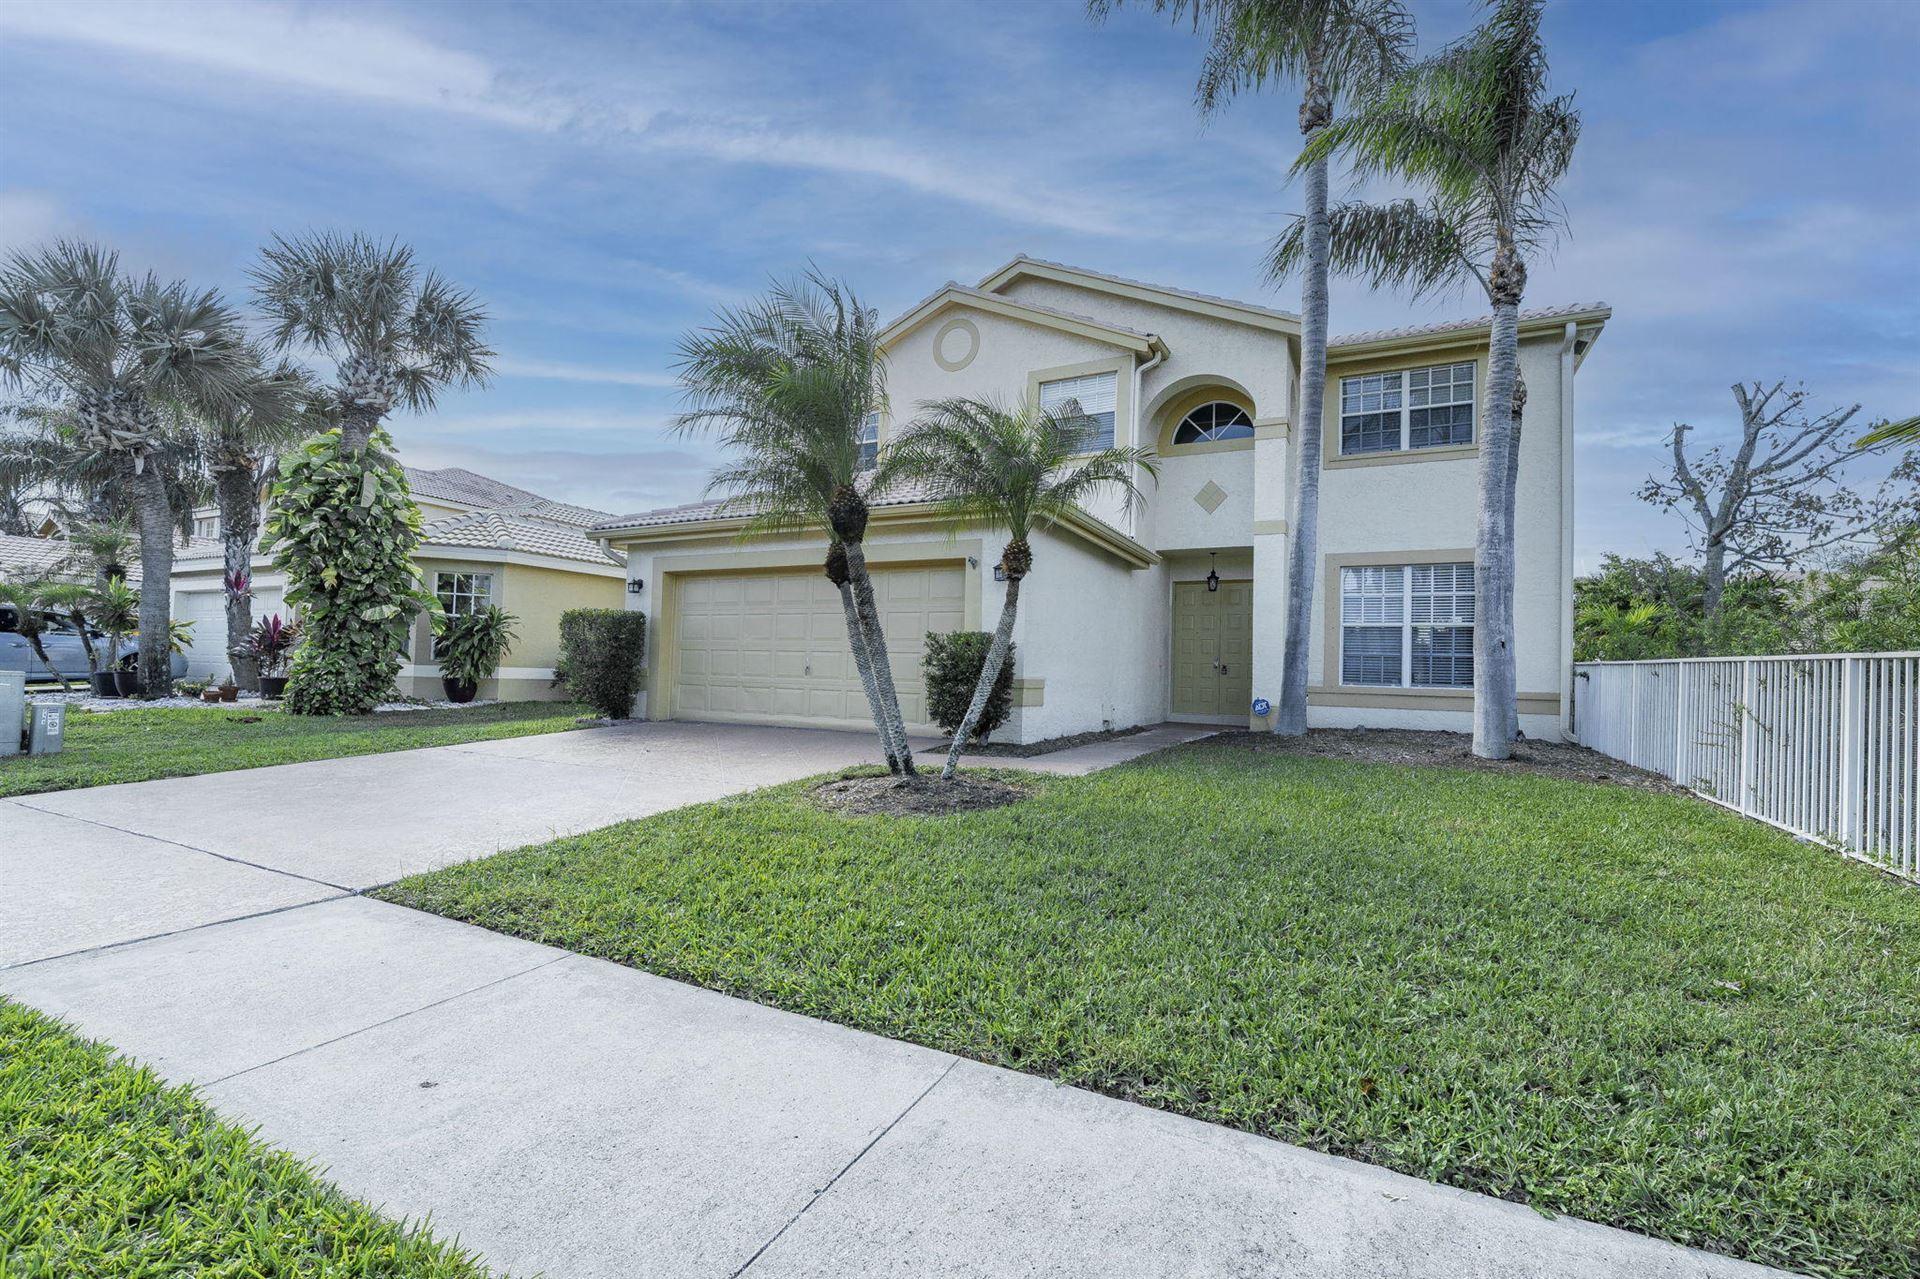 Photo of 7173 Chesapeake Circle, Boynton Beach, FL 33436 (MLS # RX-10675748)